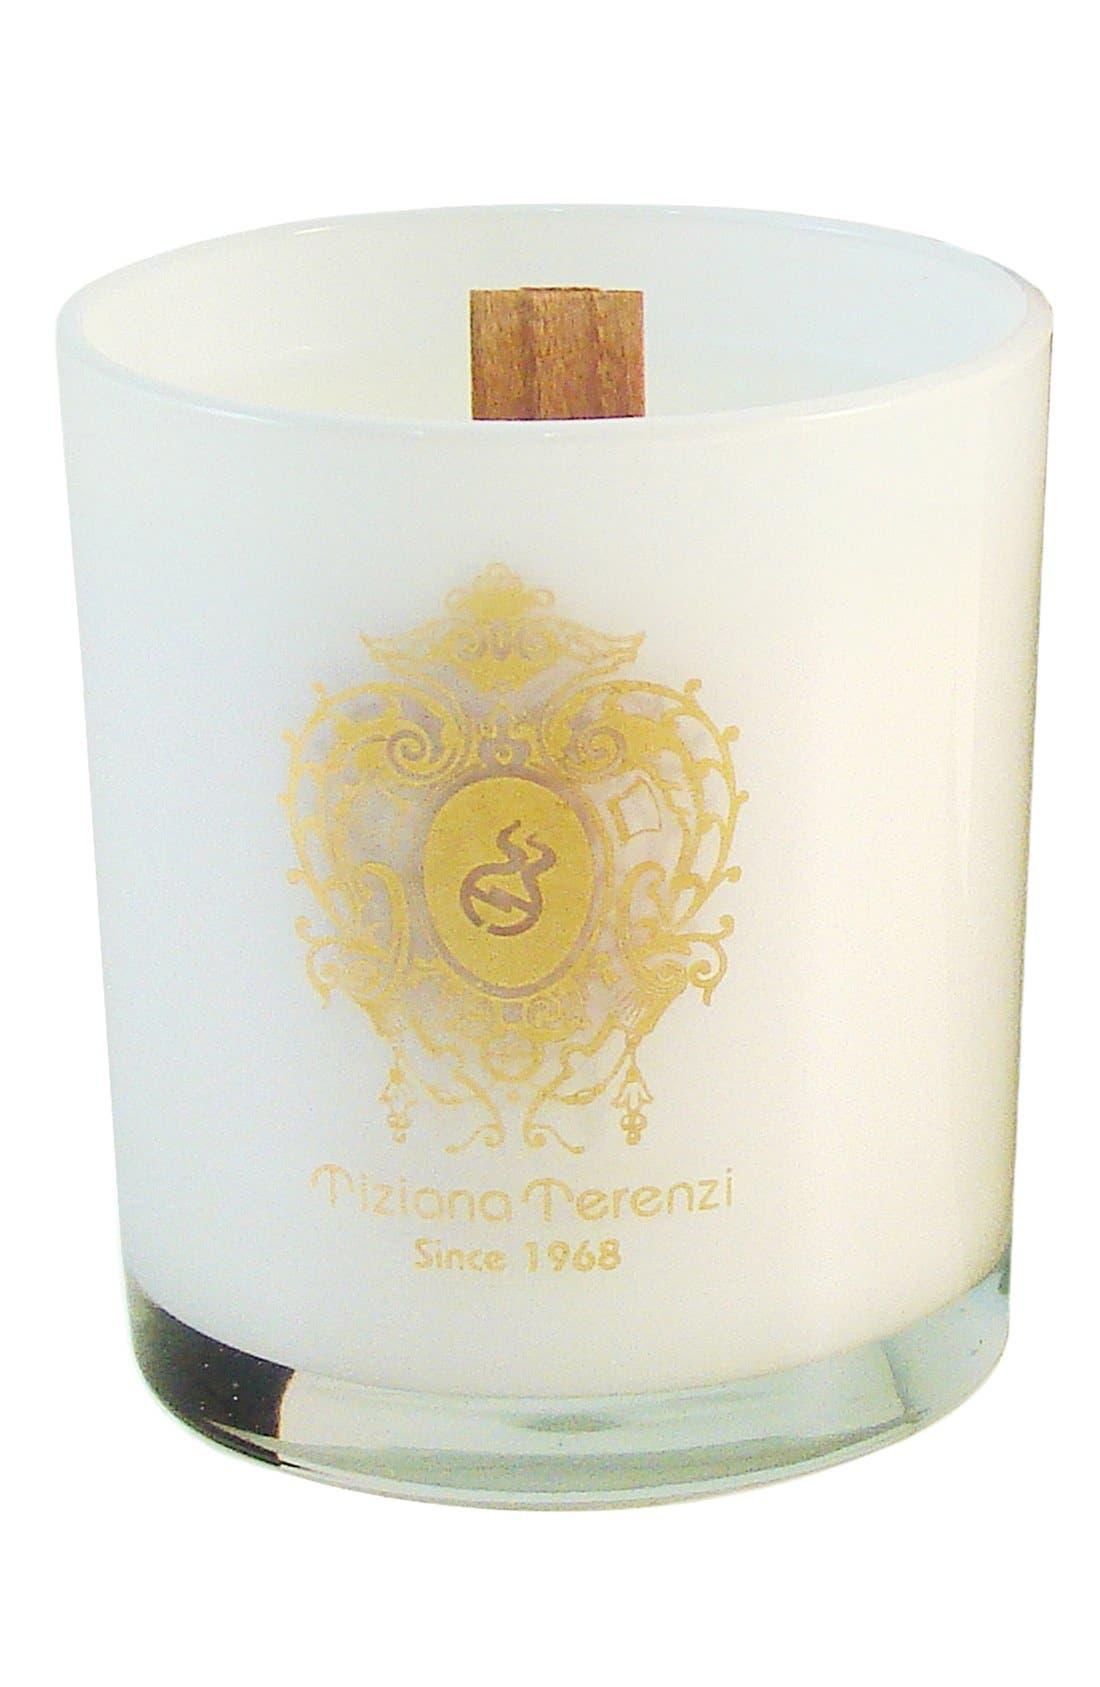 Main Image - Tiziana Terenzi 'Spicy Snow' Single Wick Gioconda Candle